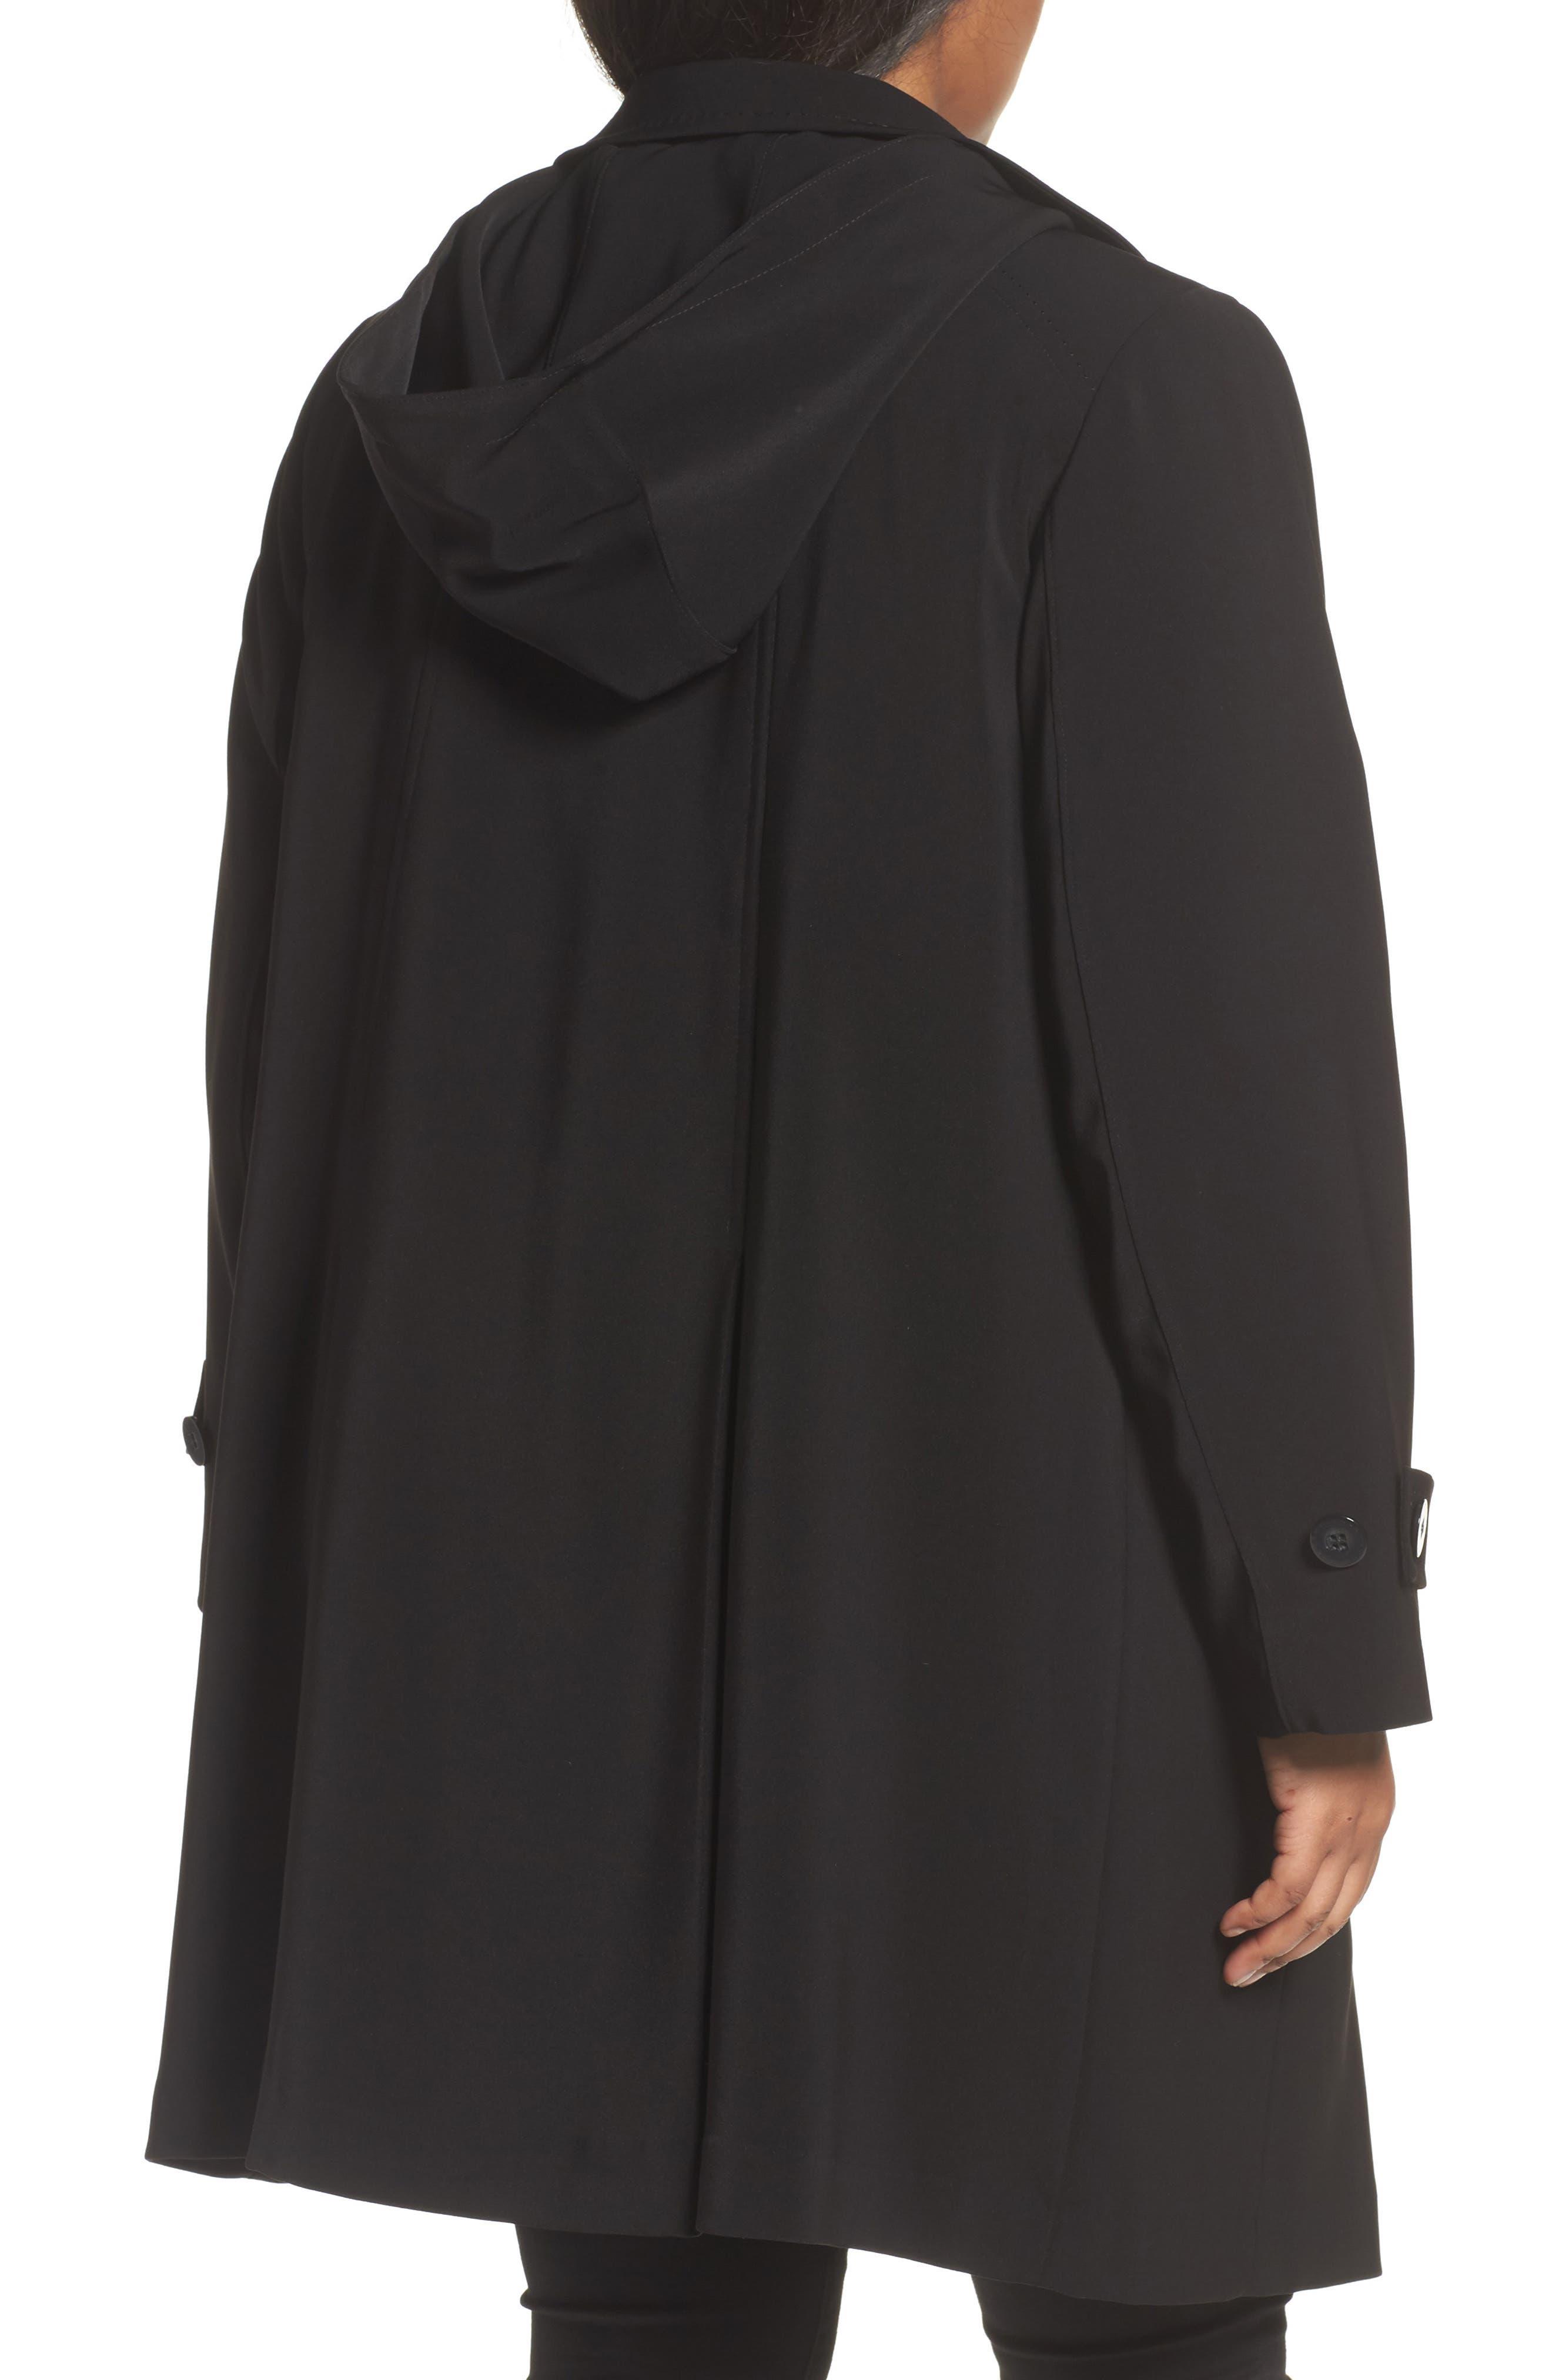 A-Line Raincoat with Detachable Hood & Liner,                             Alternate thumbnail 2, color,                             001